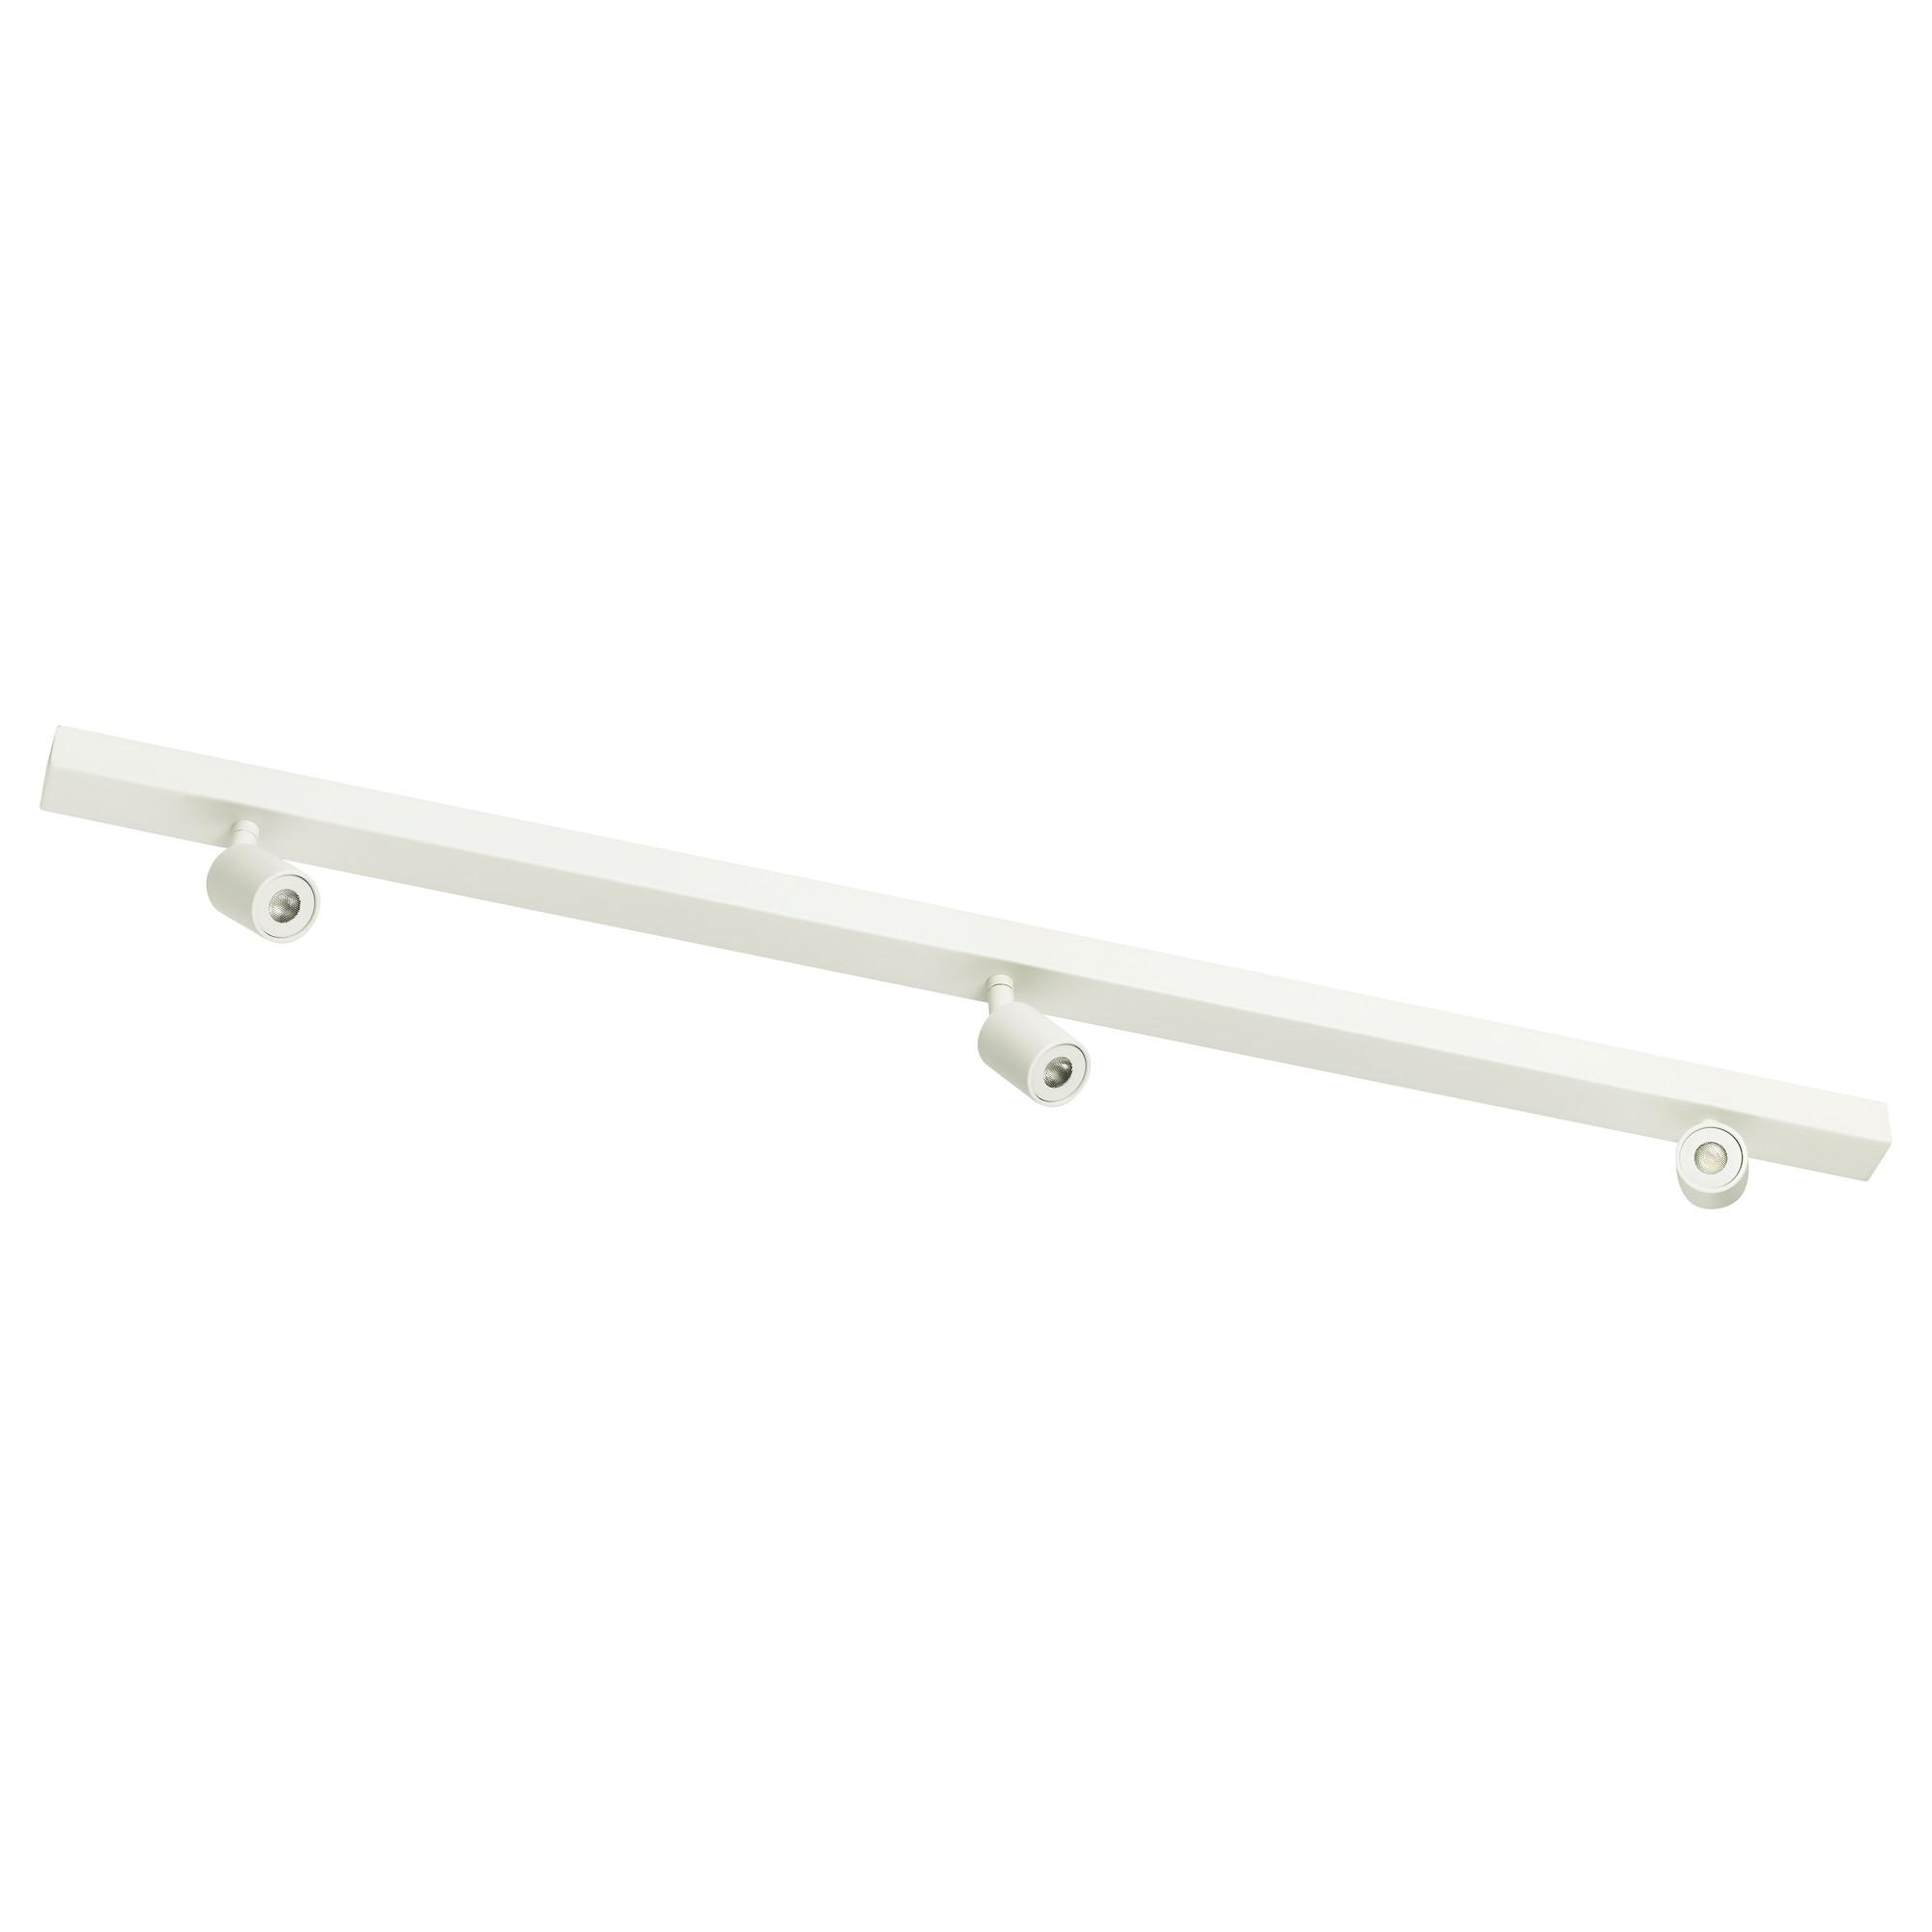 Ikea mallorca detalles producto for Plafones led ikea